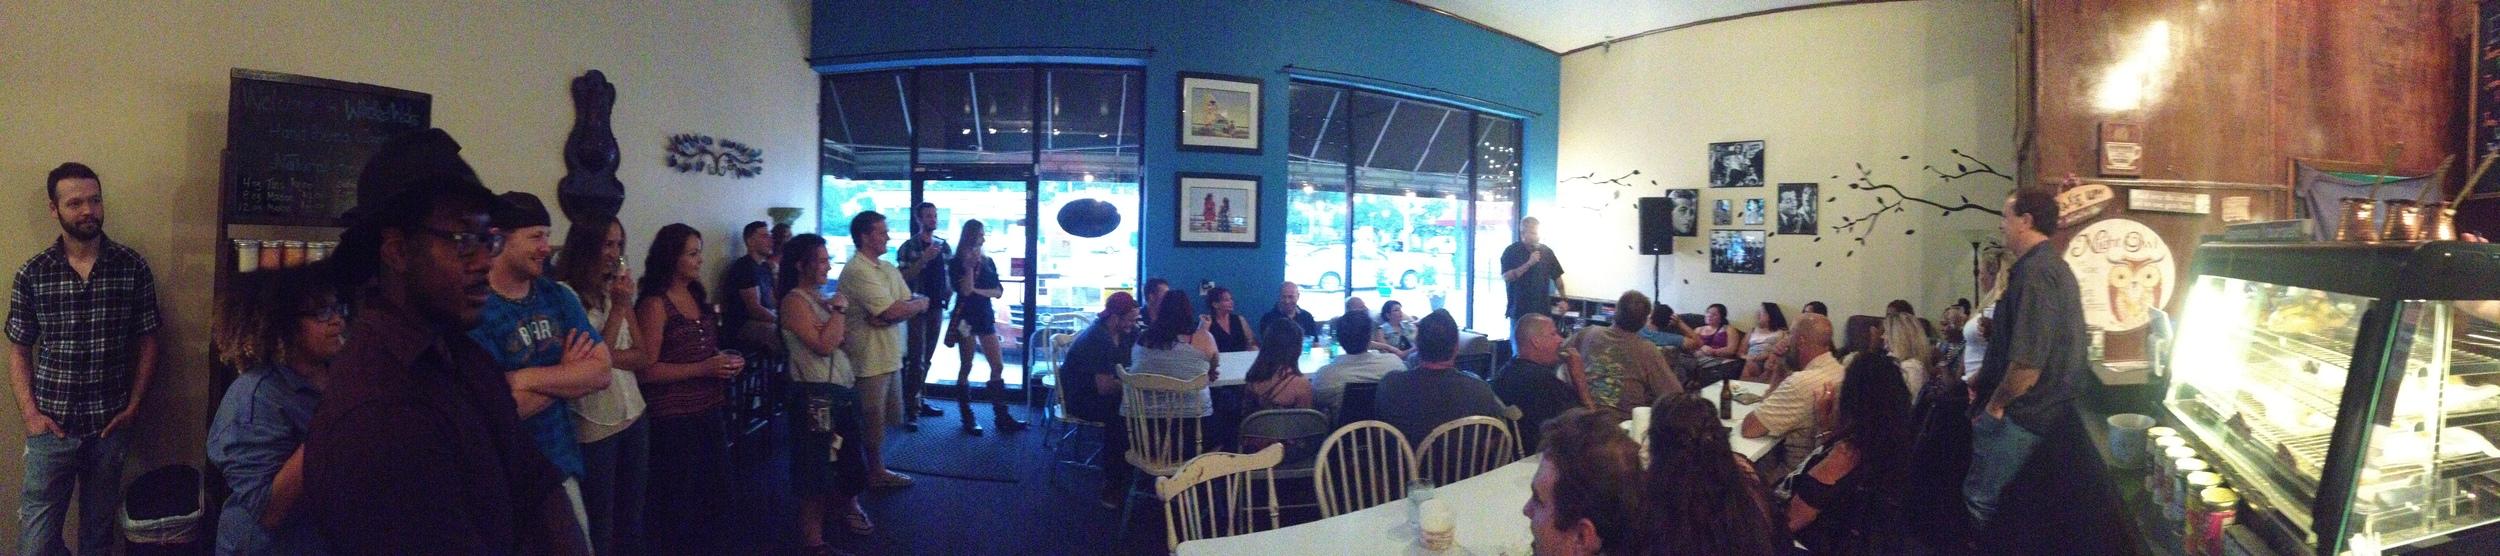 Packed house at Briki Coffee in Norfolk, Va!